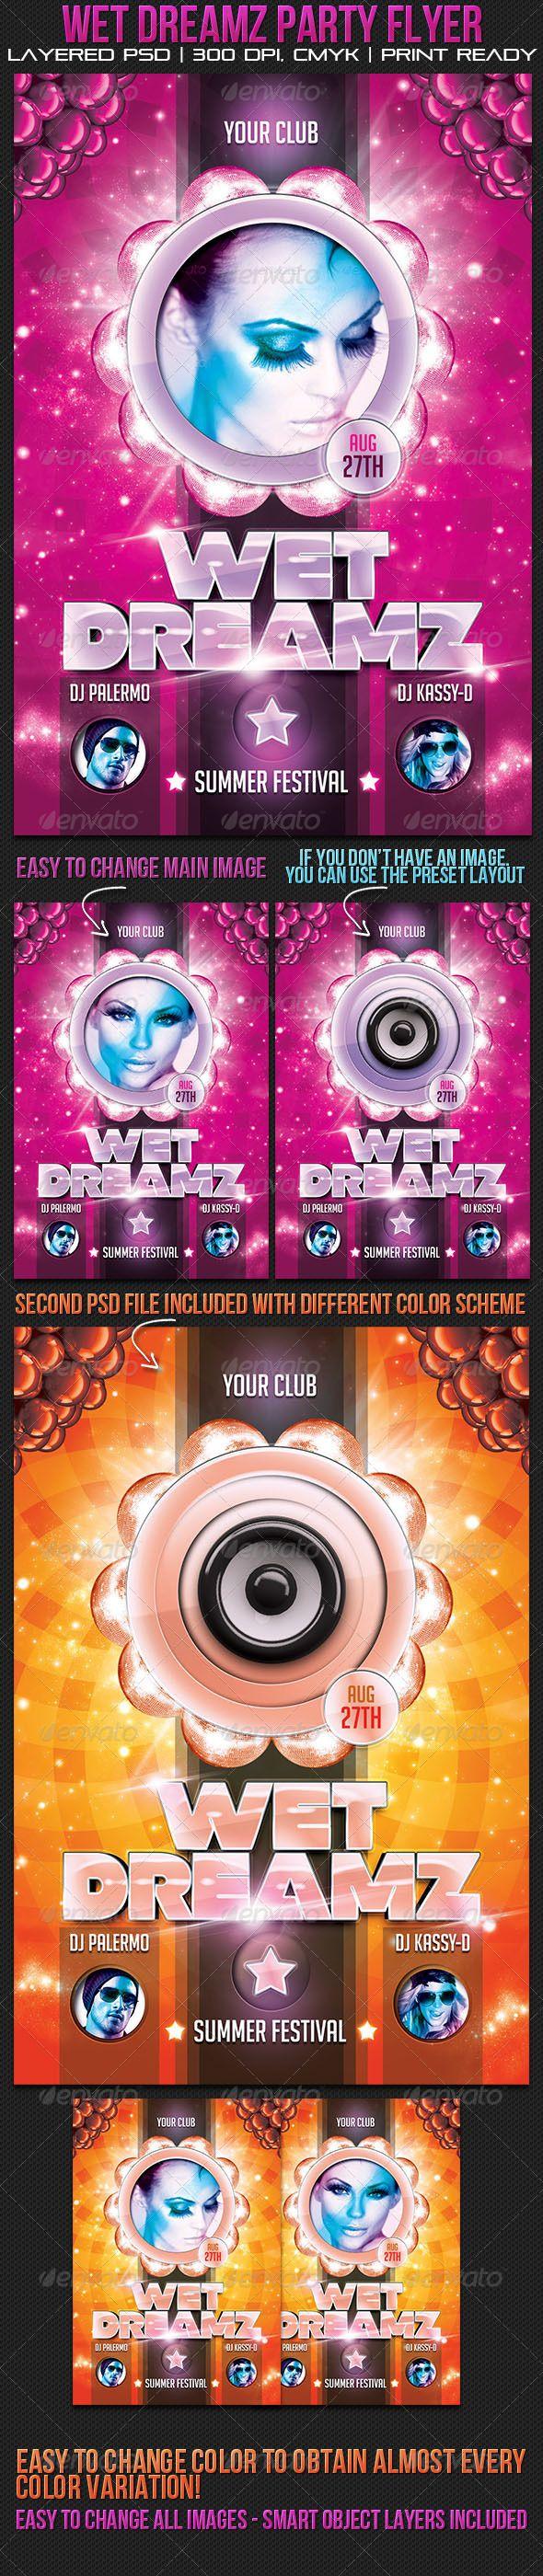 Wet Dreamz Party Flyer - GraphicRiver Item for Sale